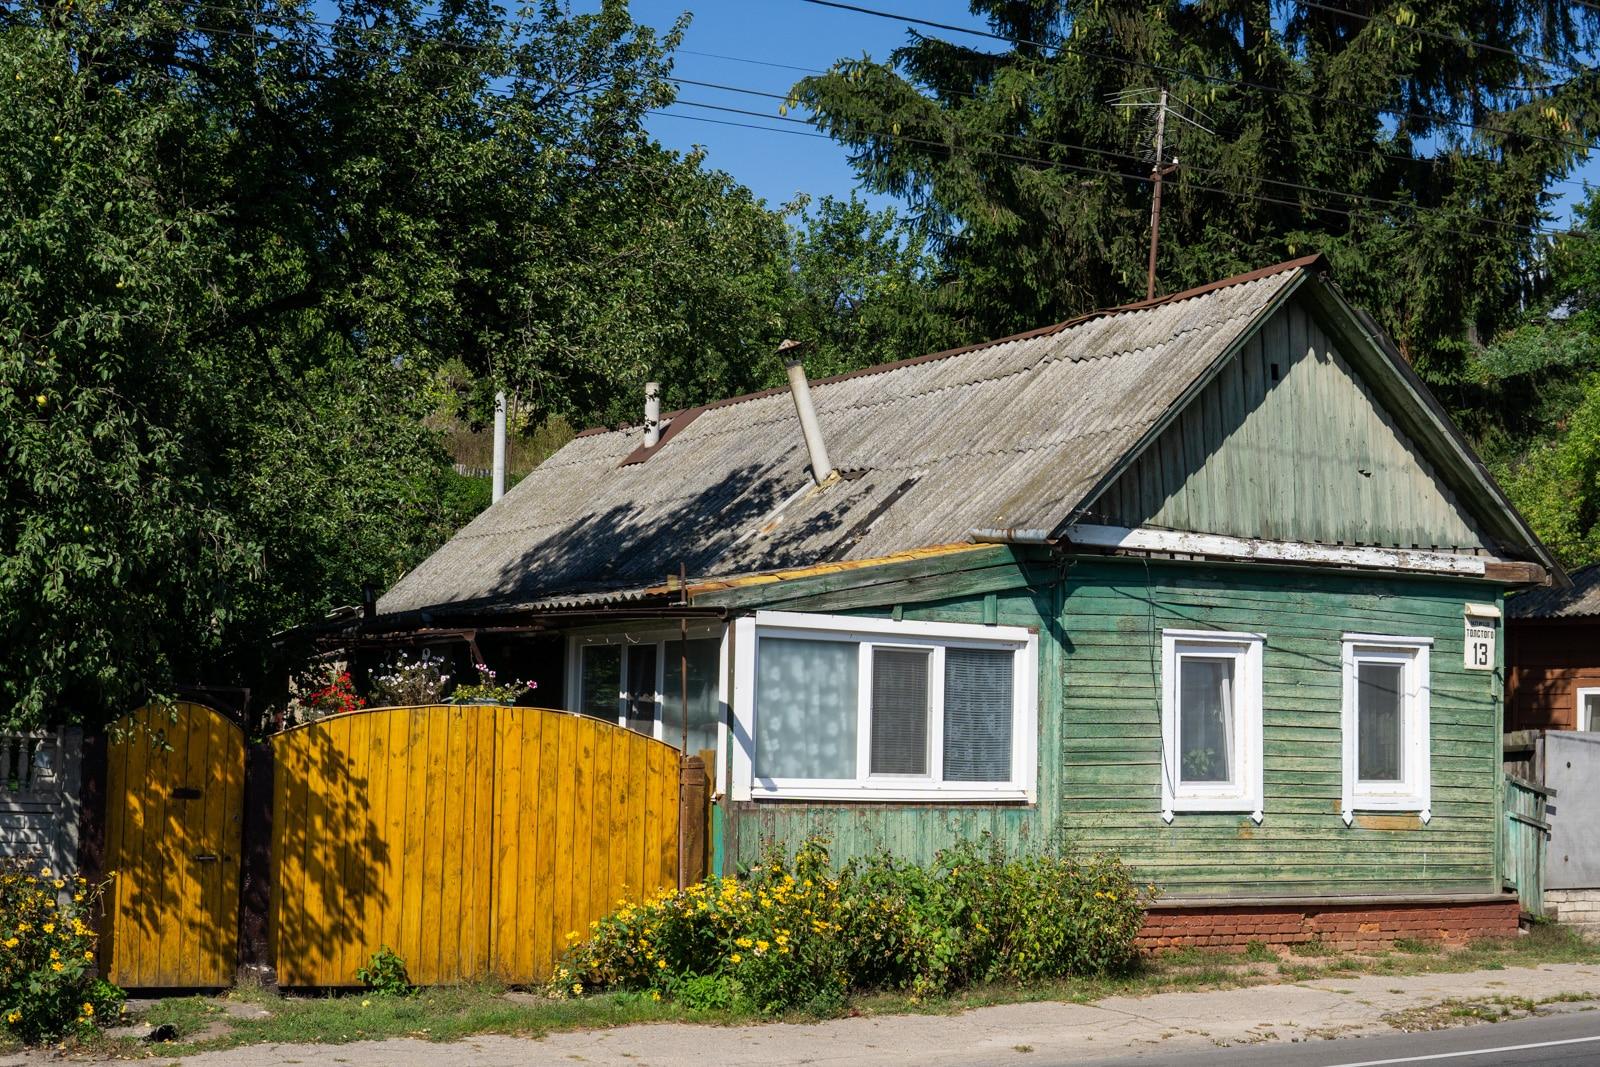 Casa en Chernihiv, Ucrania